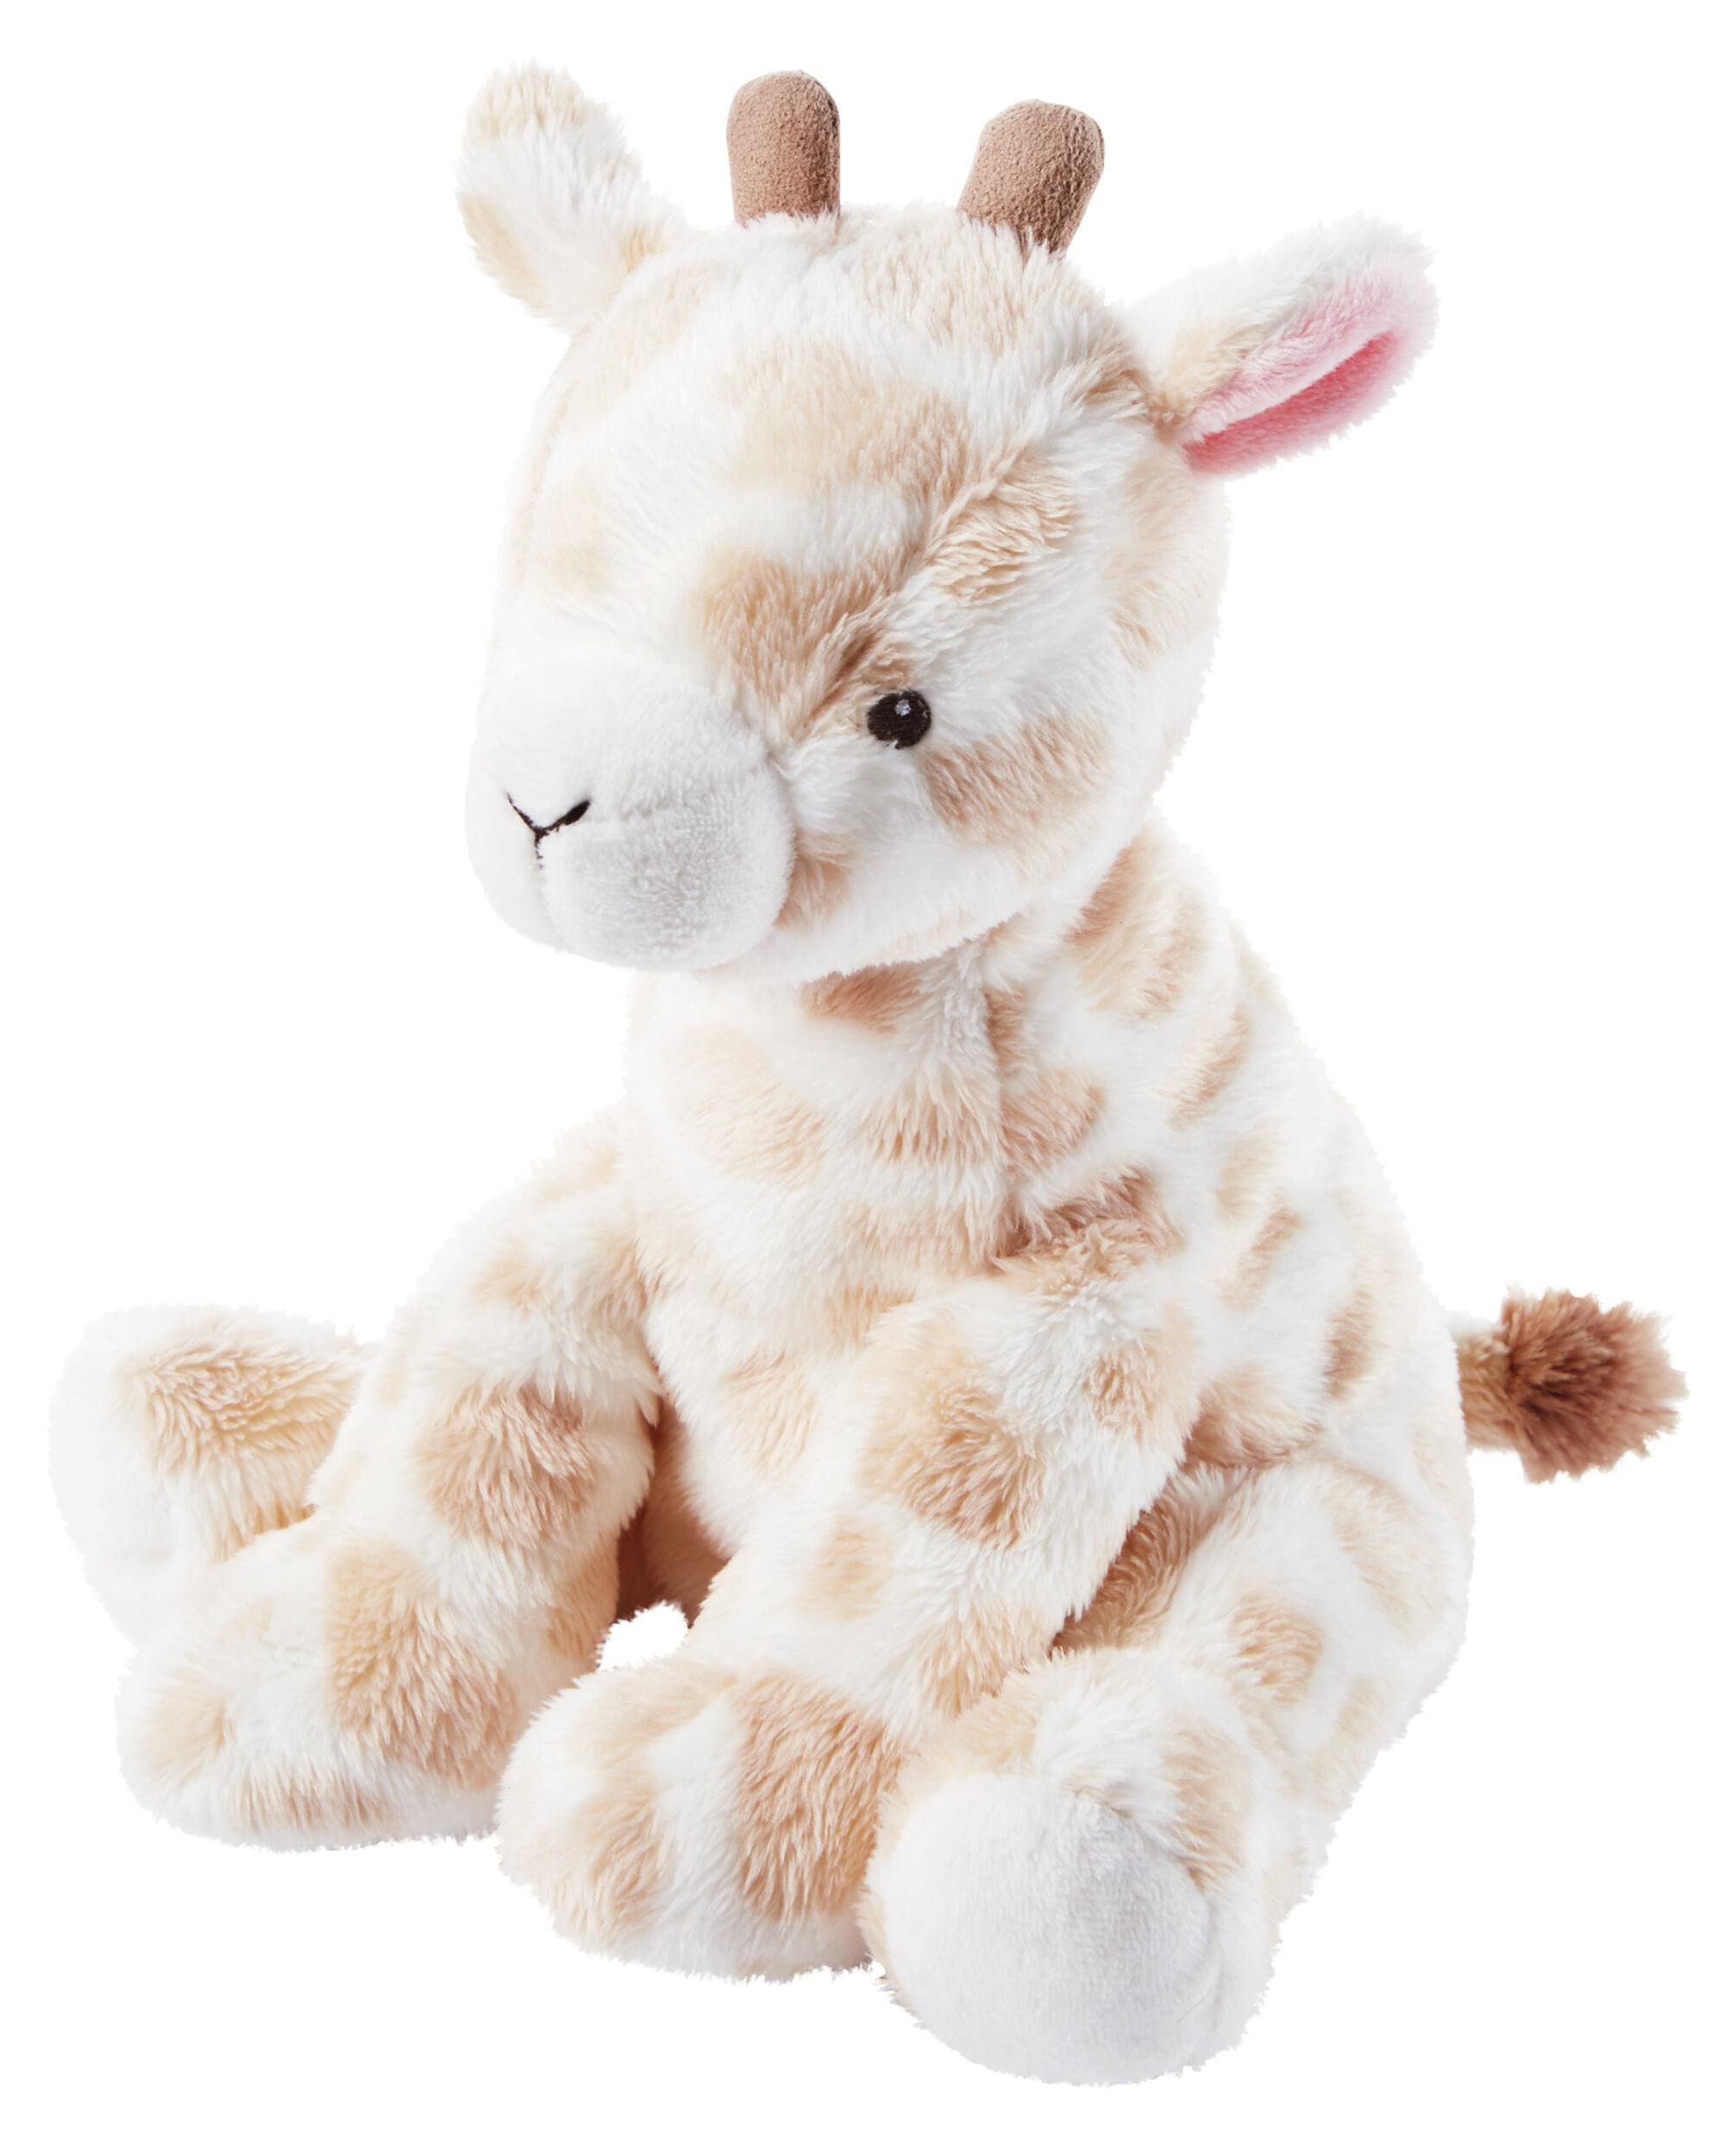 Giraffe Plush. Loading zoom  sc 1 st  Carteru0027s & Giraffe Plush | Carters.com